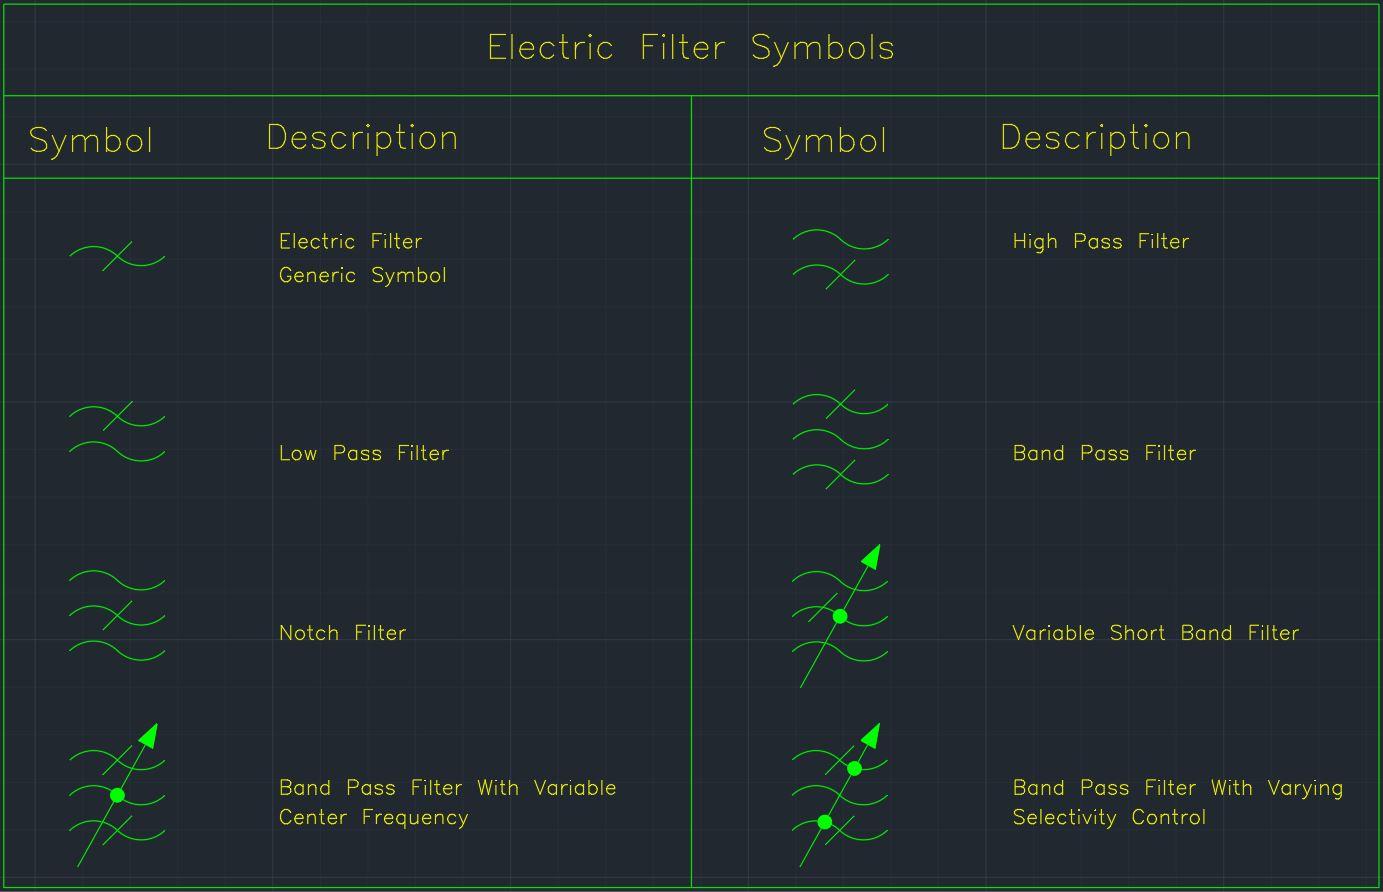 Cad Schematics Water Supply - Wiring Diagram For Light Switch •